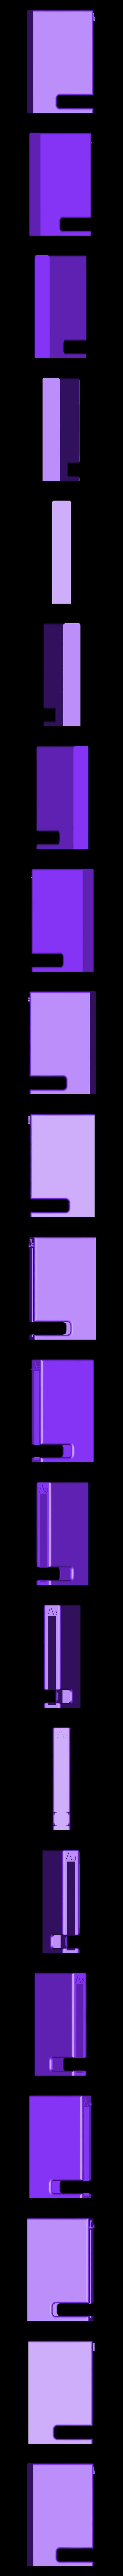 AAA_holder.stl Download free STL file Battery Holder • Design to 3D print, milasls